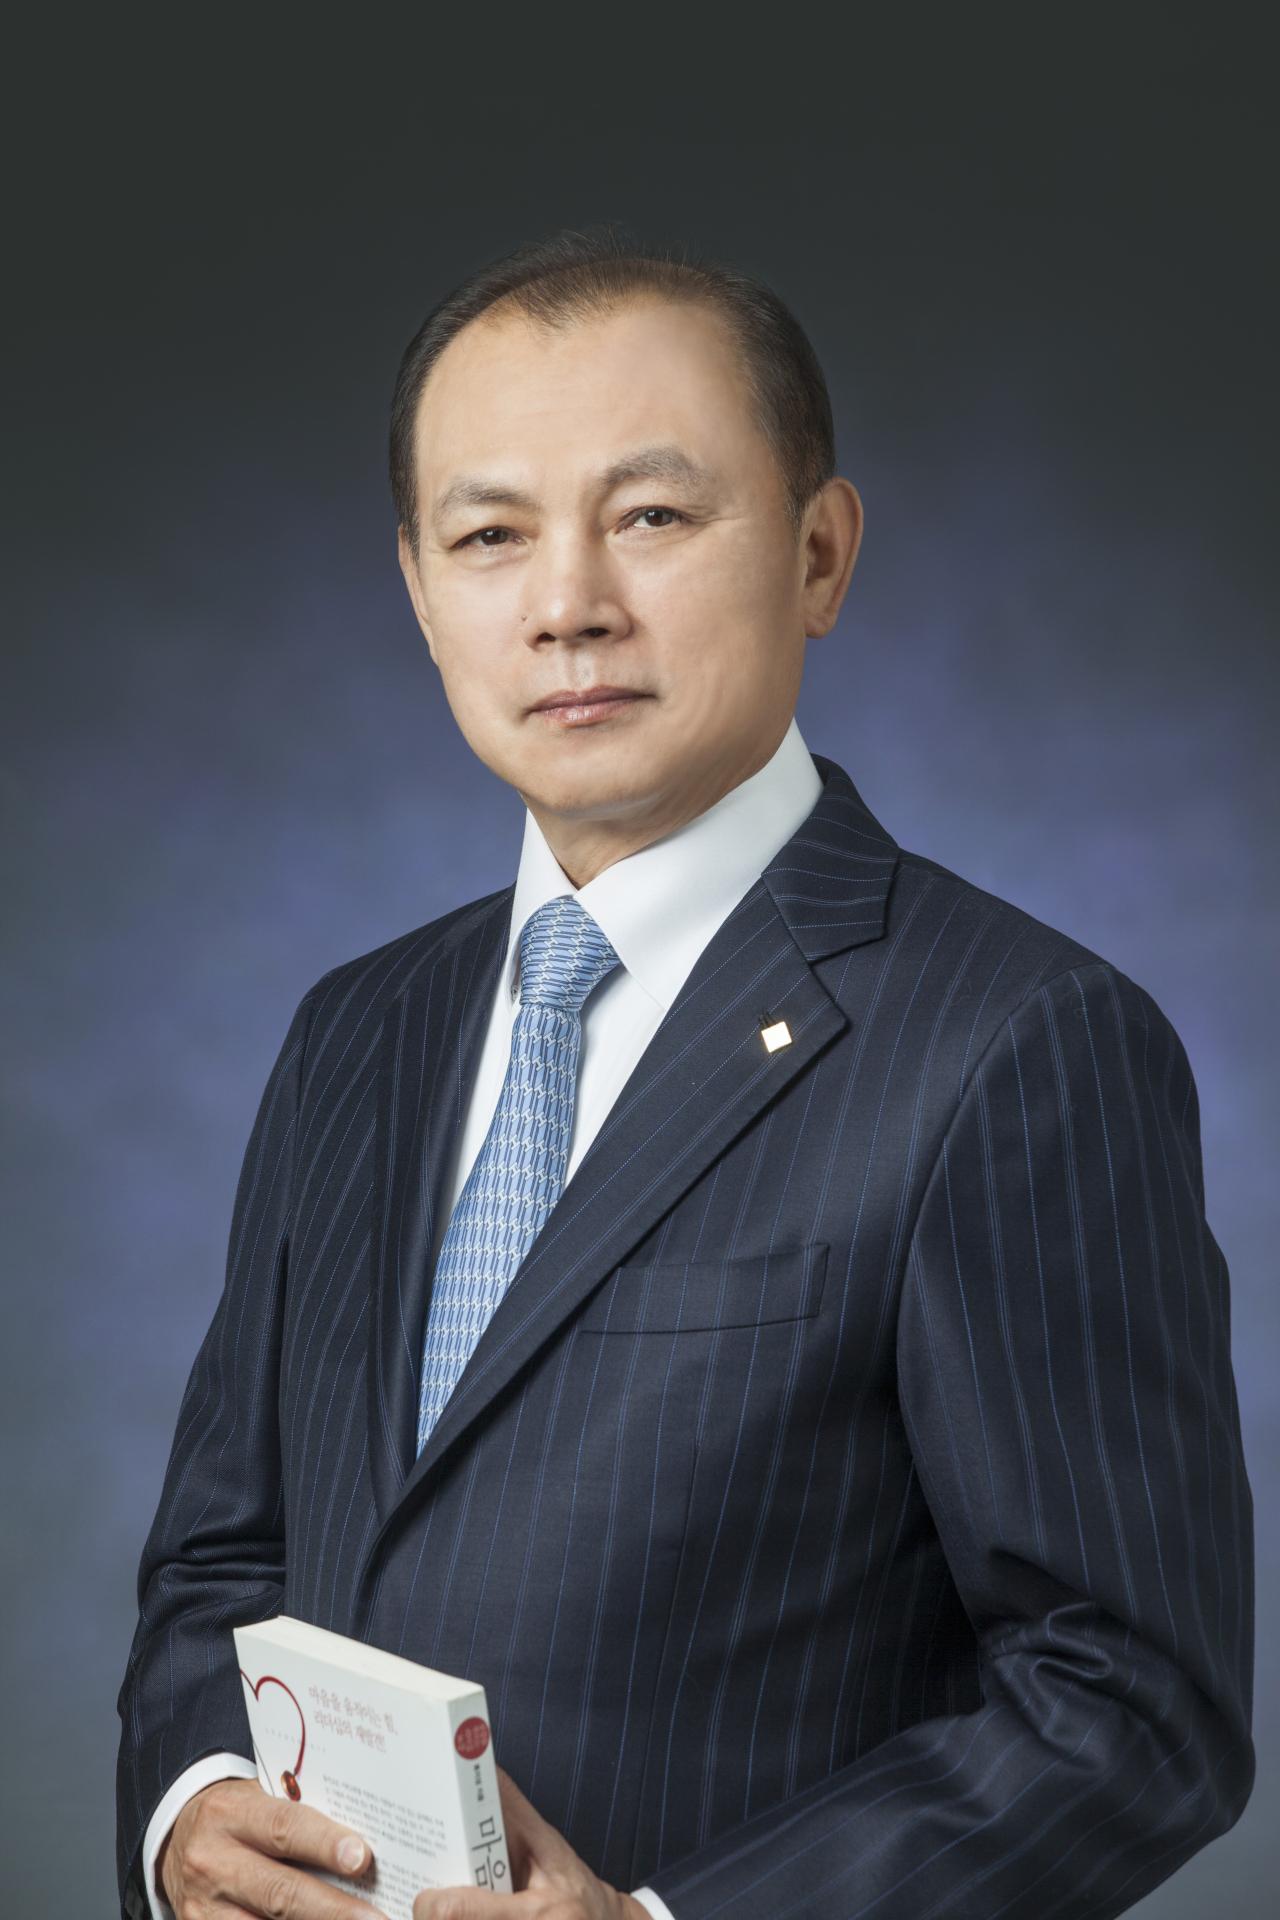 Yim Young-taick, incumbent senior executive officer at JB Financial Group and former Jeonbuk Bank CEO